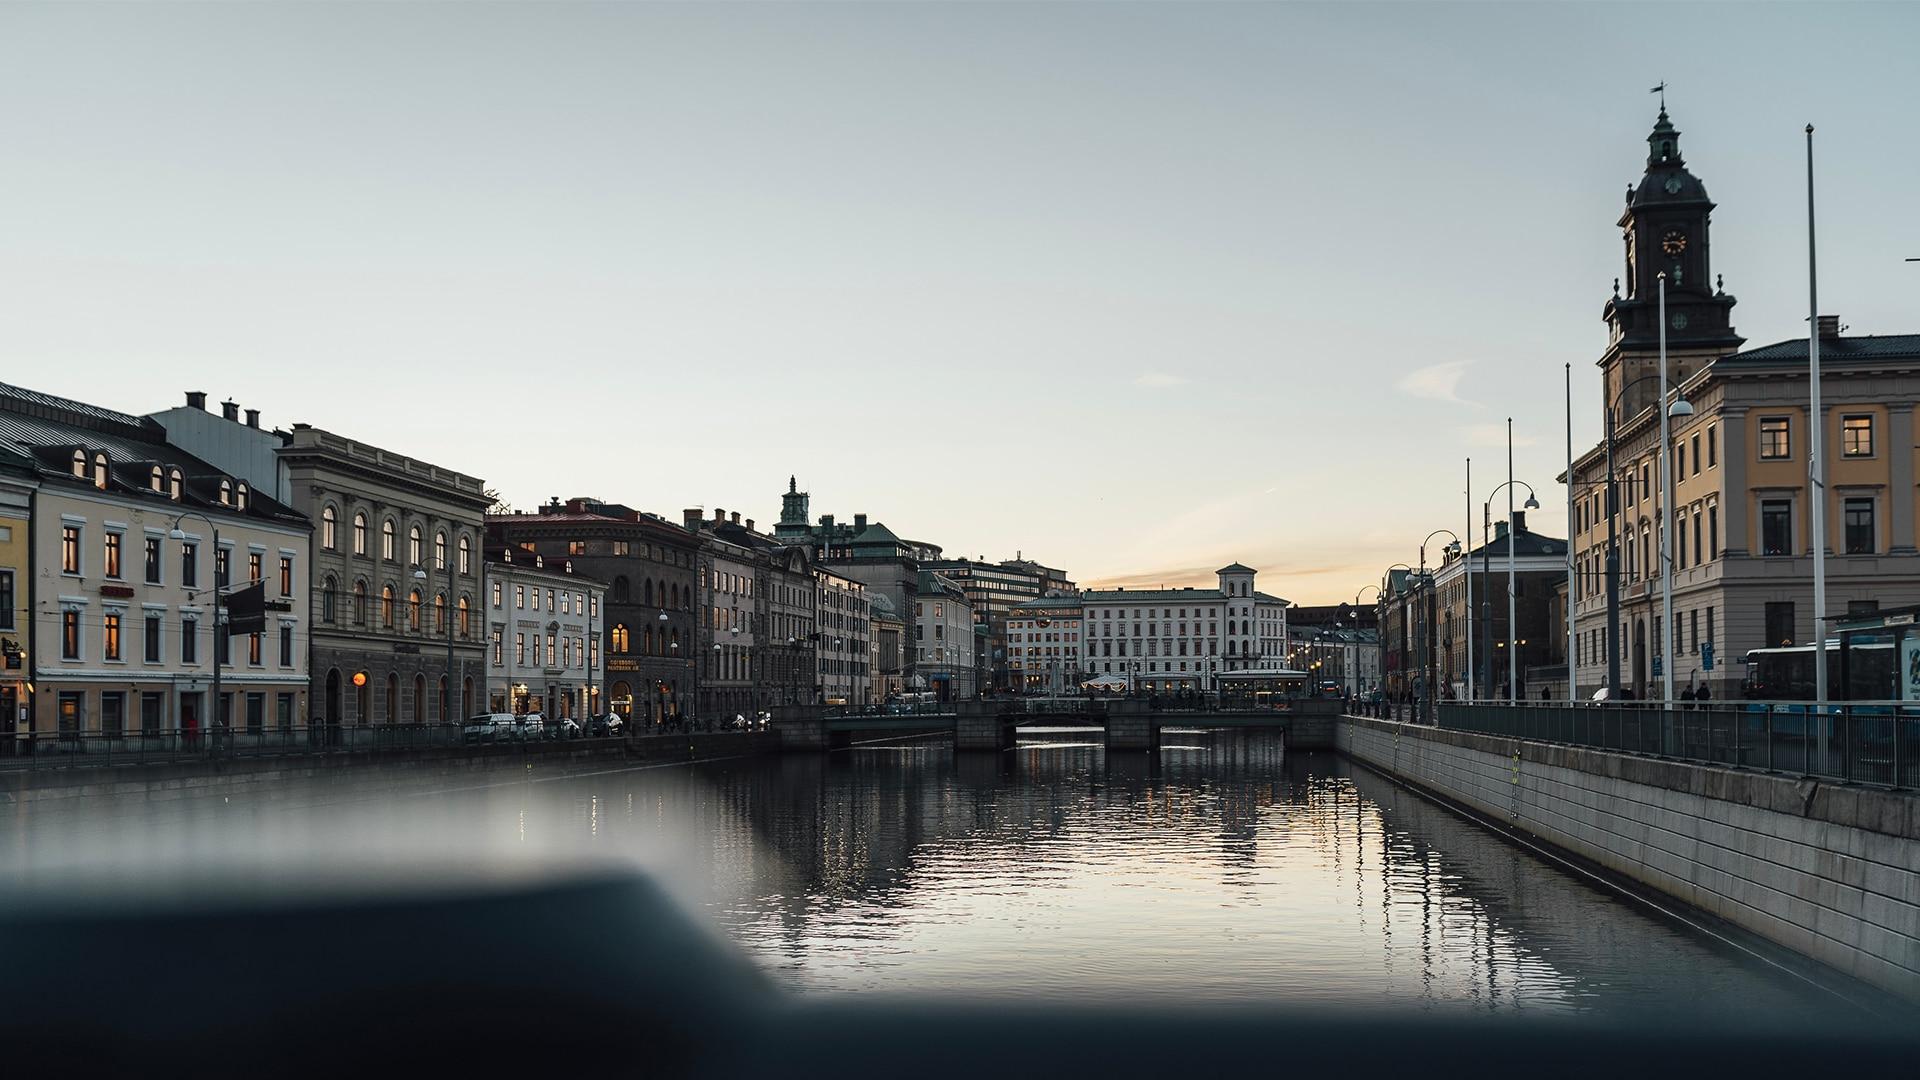 La ville de Göteborg, en Suède